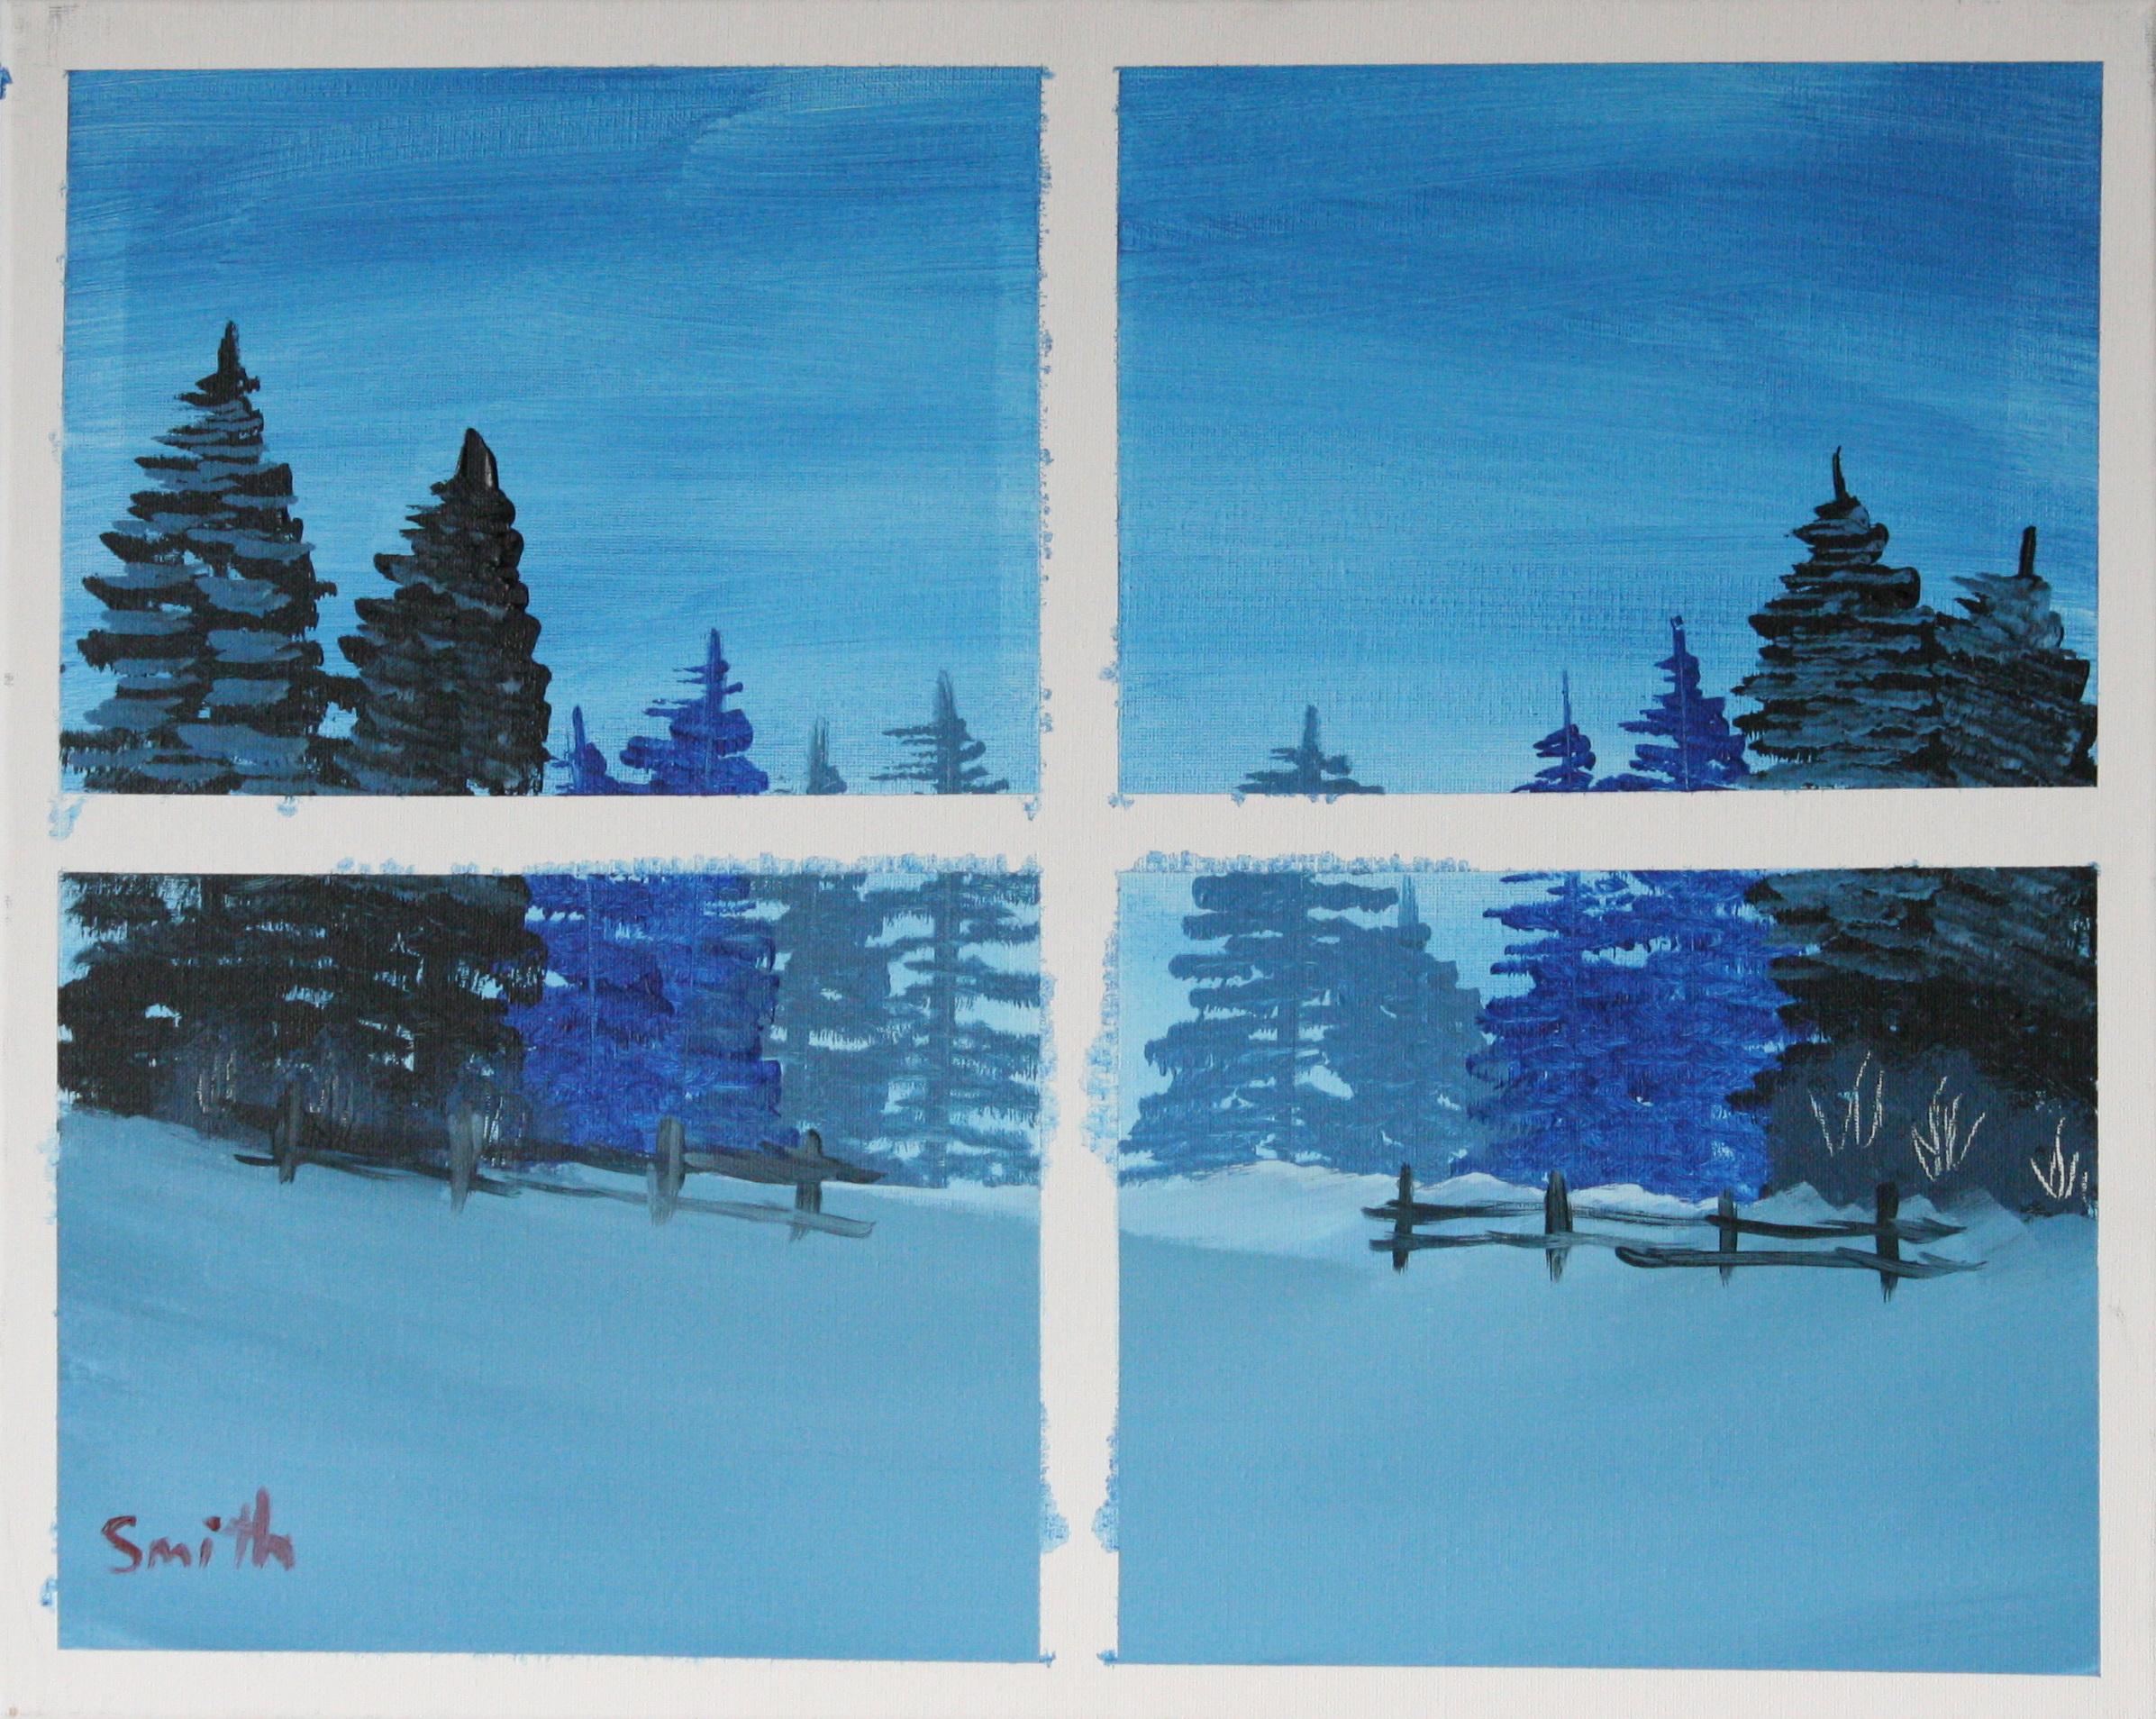 Winter-Evergreen-Through-the-Window